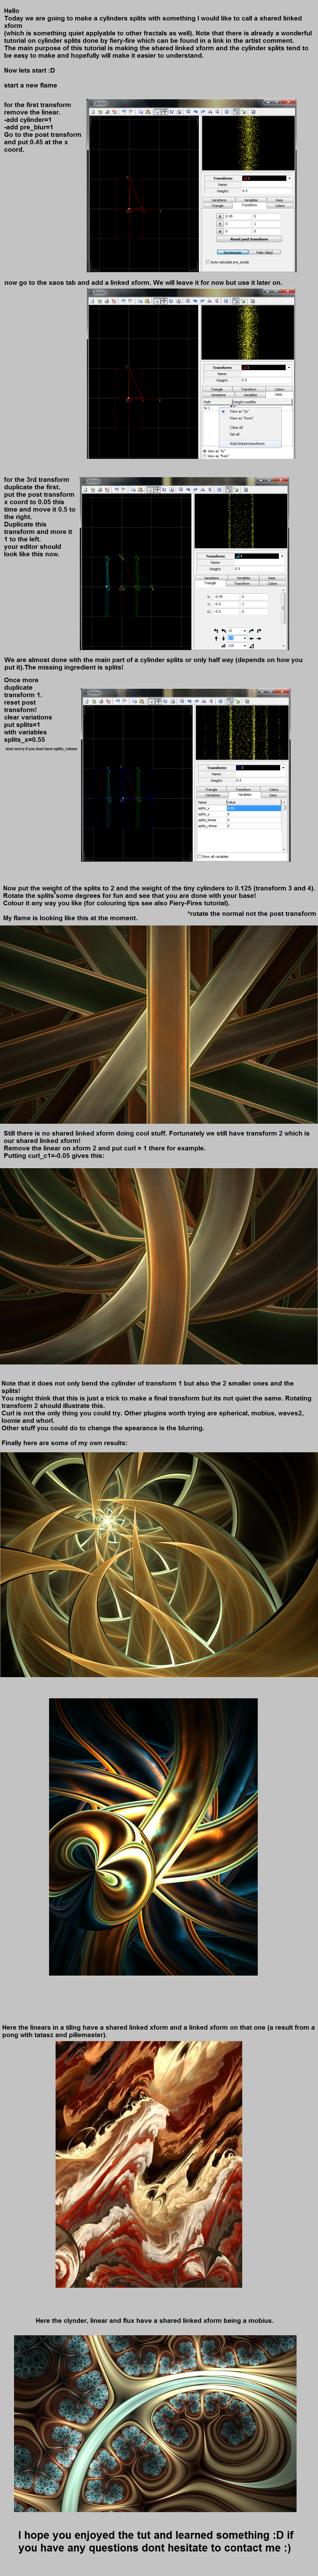 Linked Xform Tutorial by piethein21